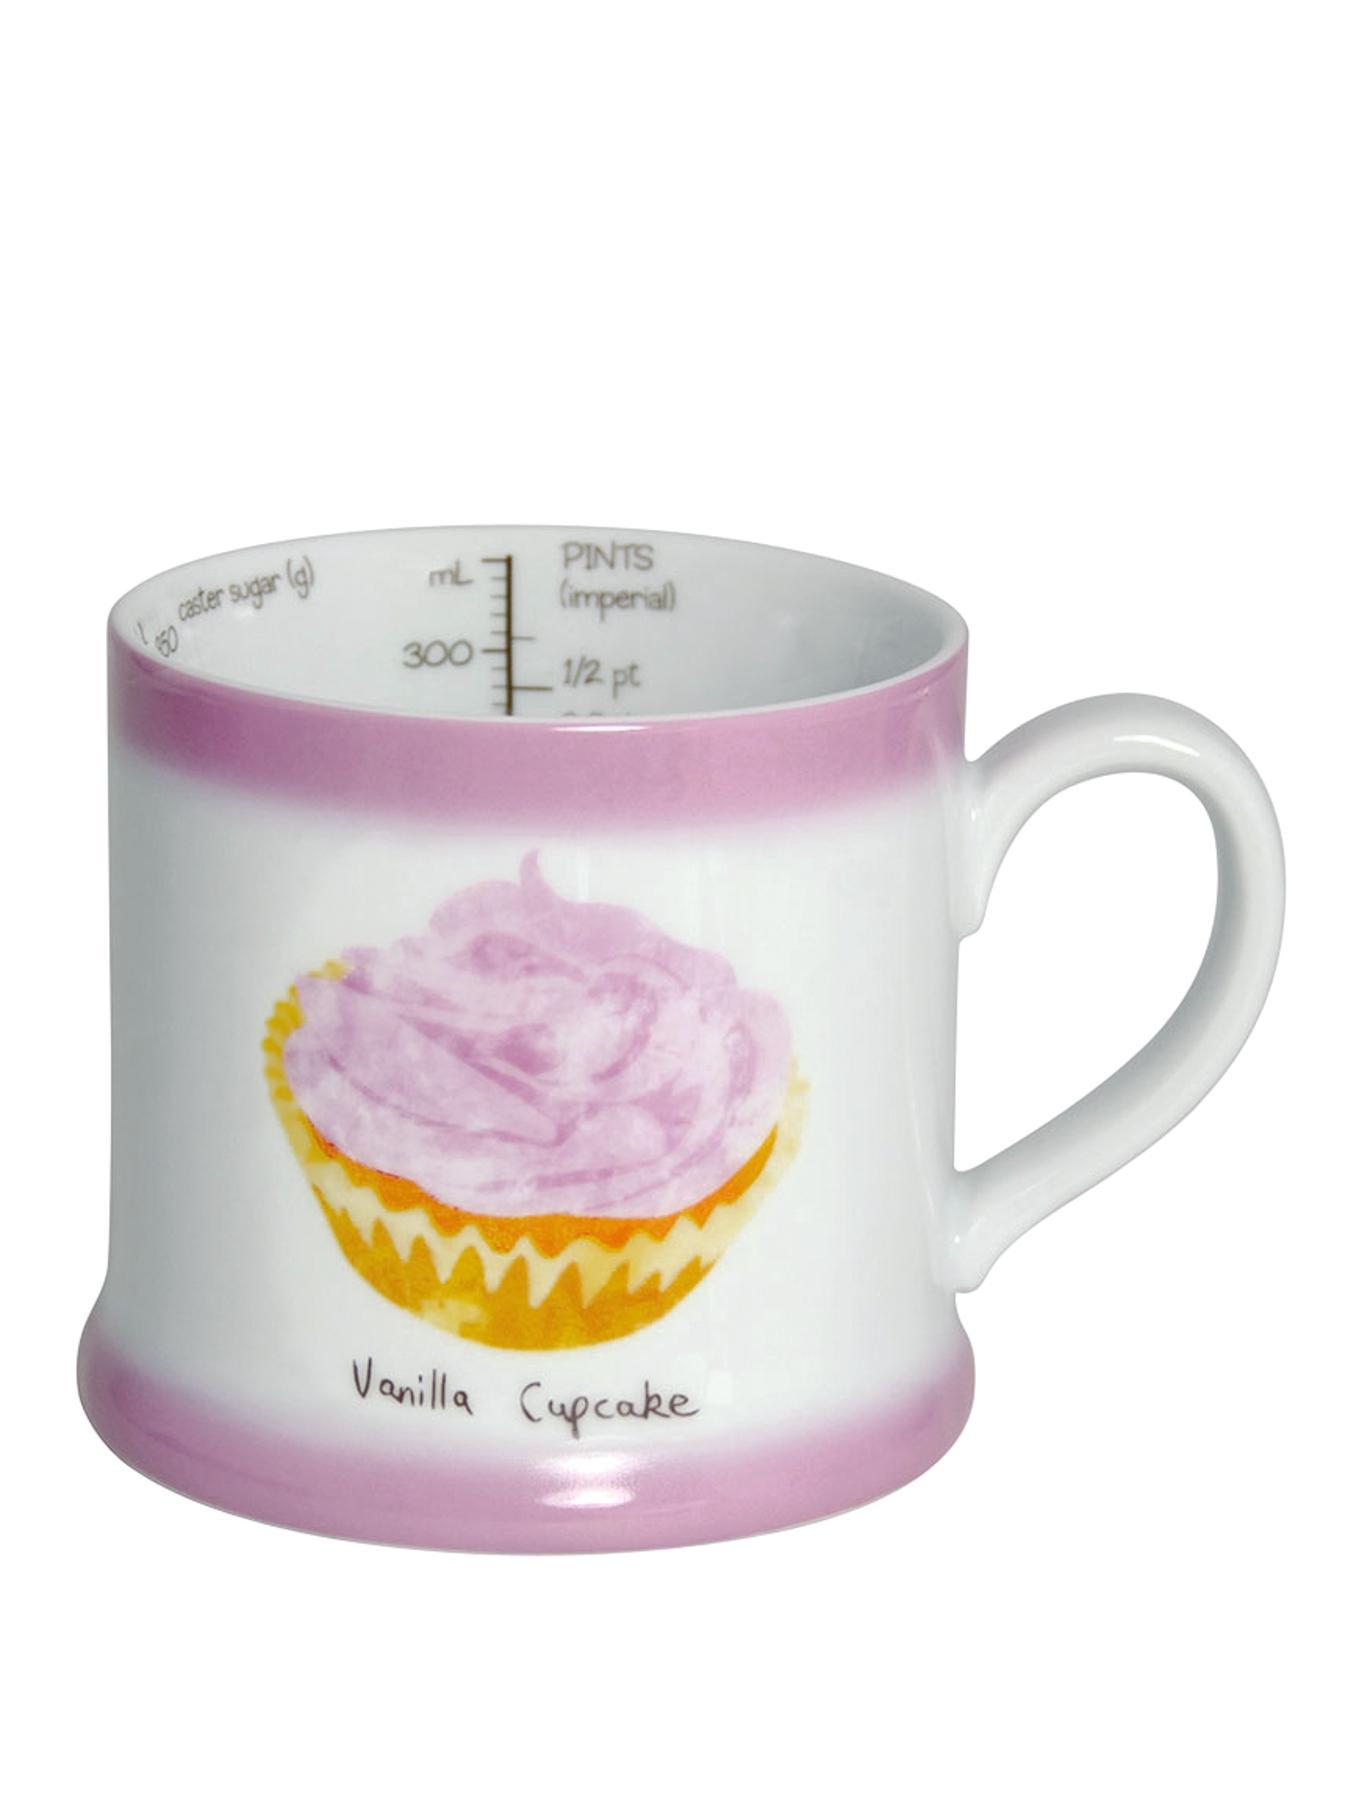 Cupcake Recipe Mug